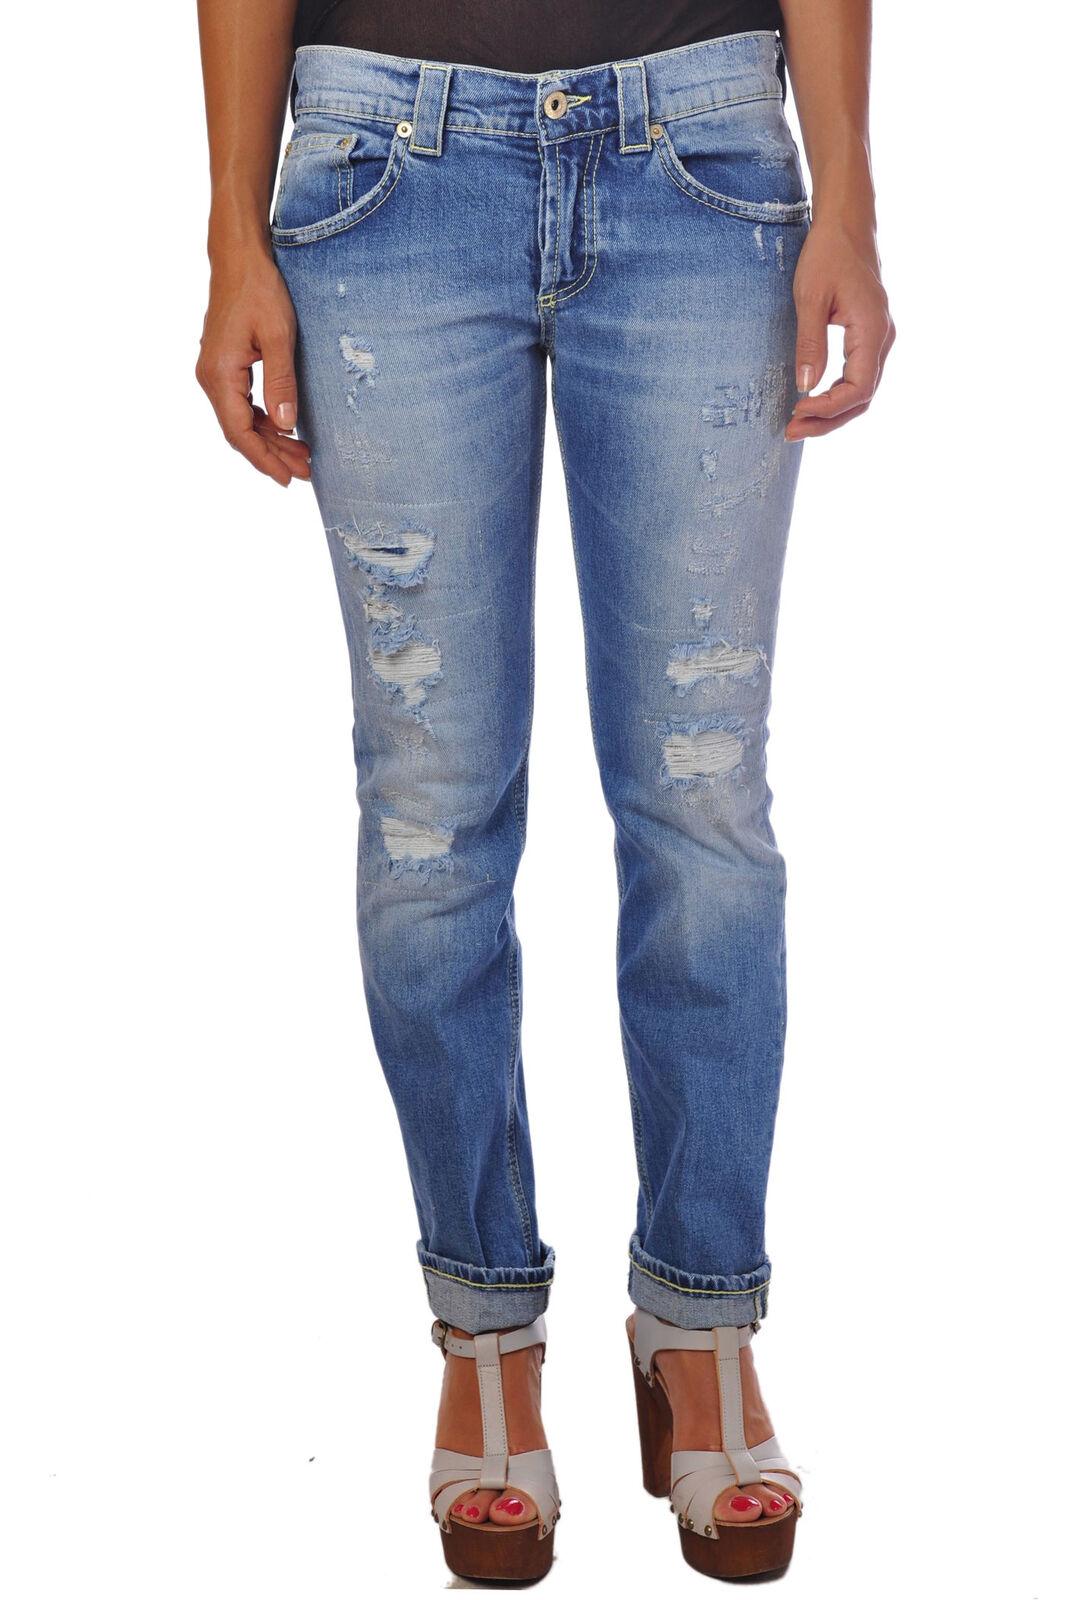 Dondup - Jeans-straight leg Pants - Woman - Denim - 375215C183646